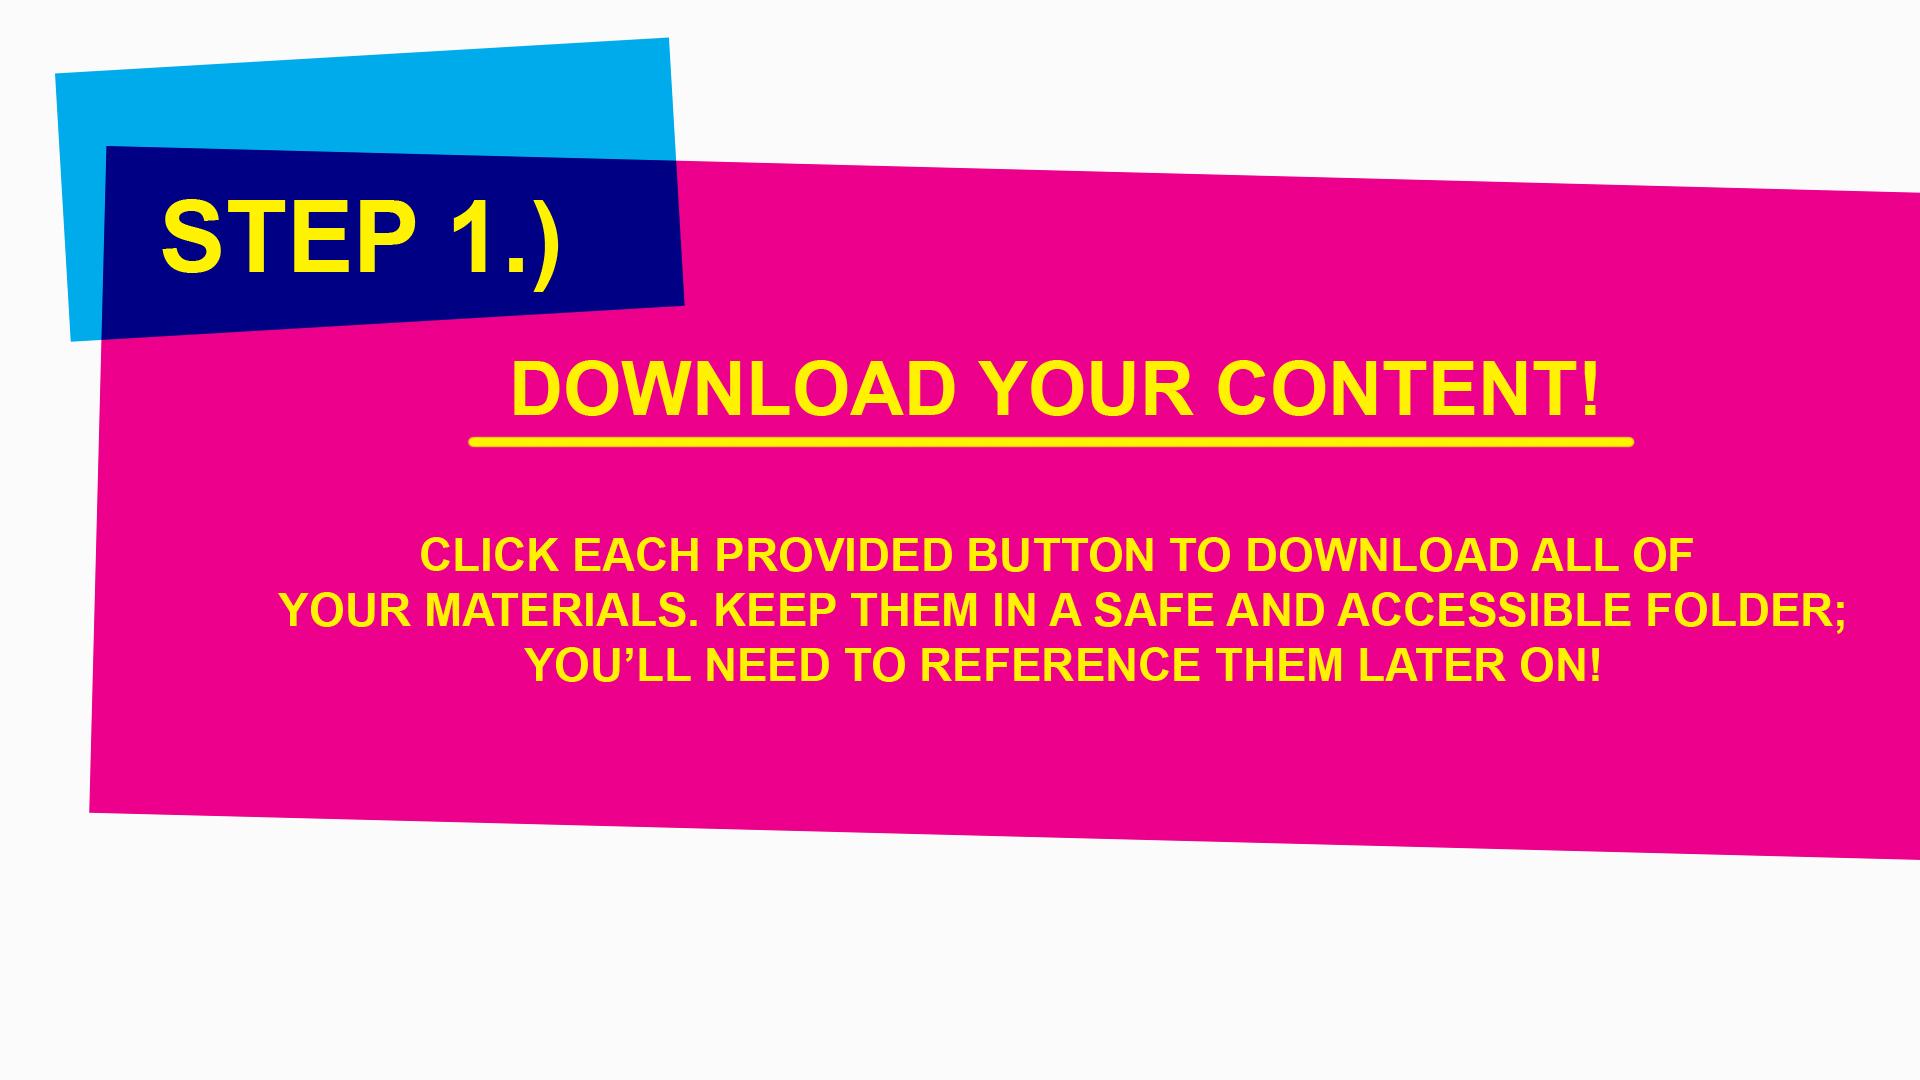 step 1 card.jpg